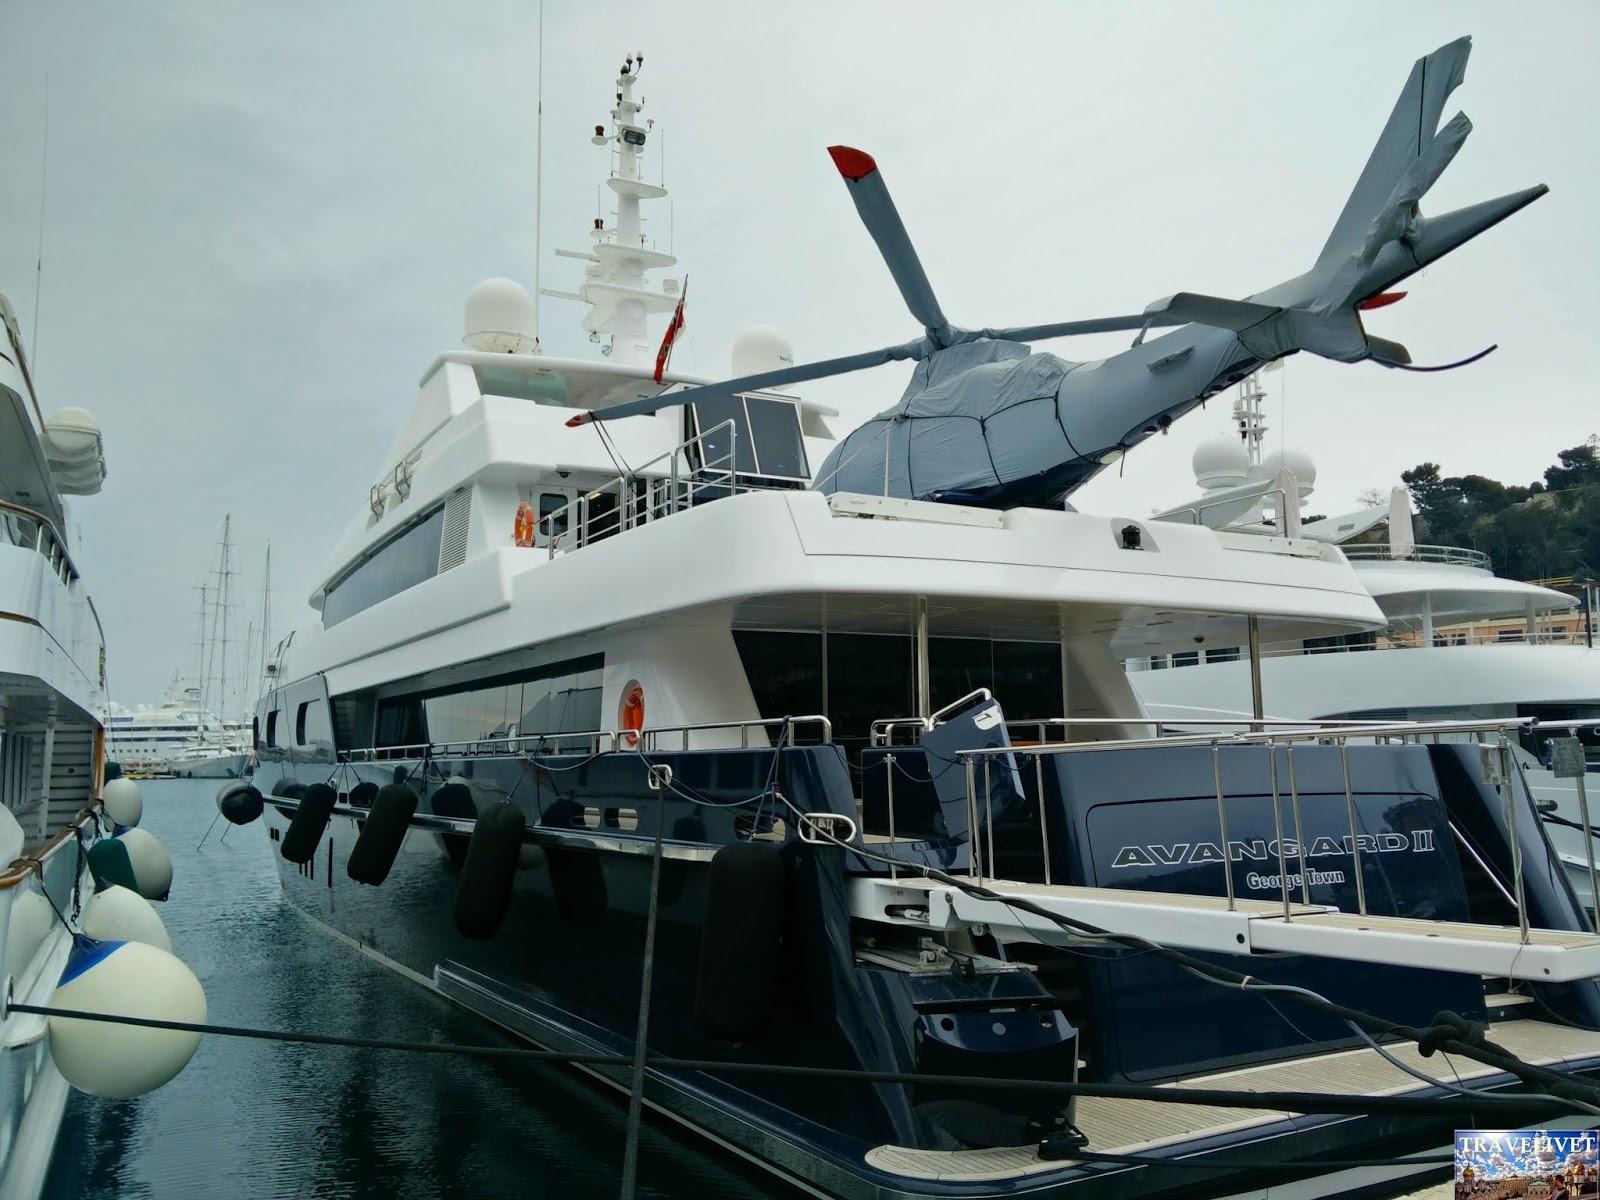 Monaco hélicoptère bateau yacht